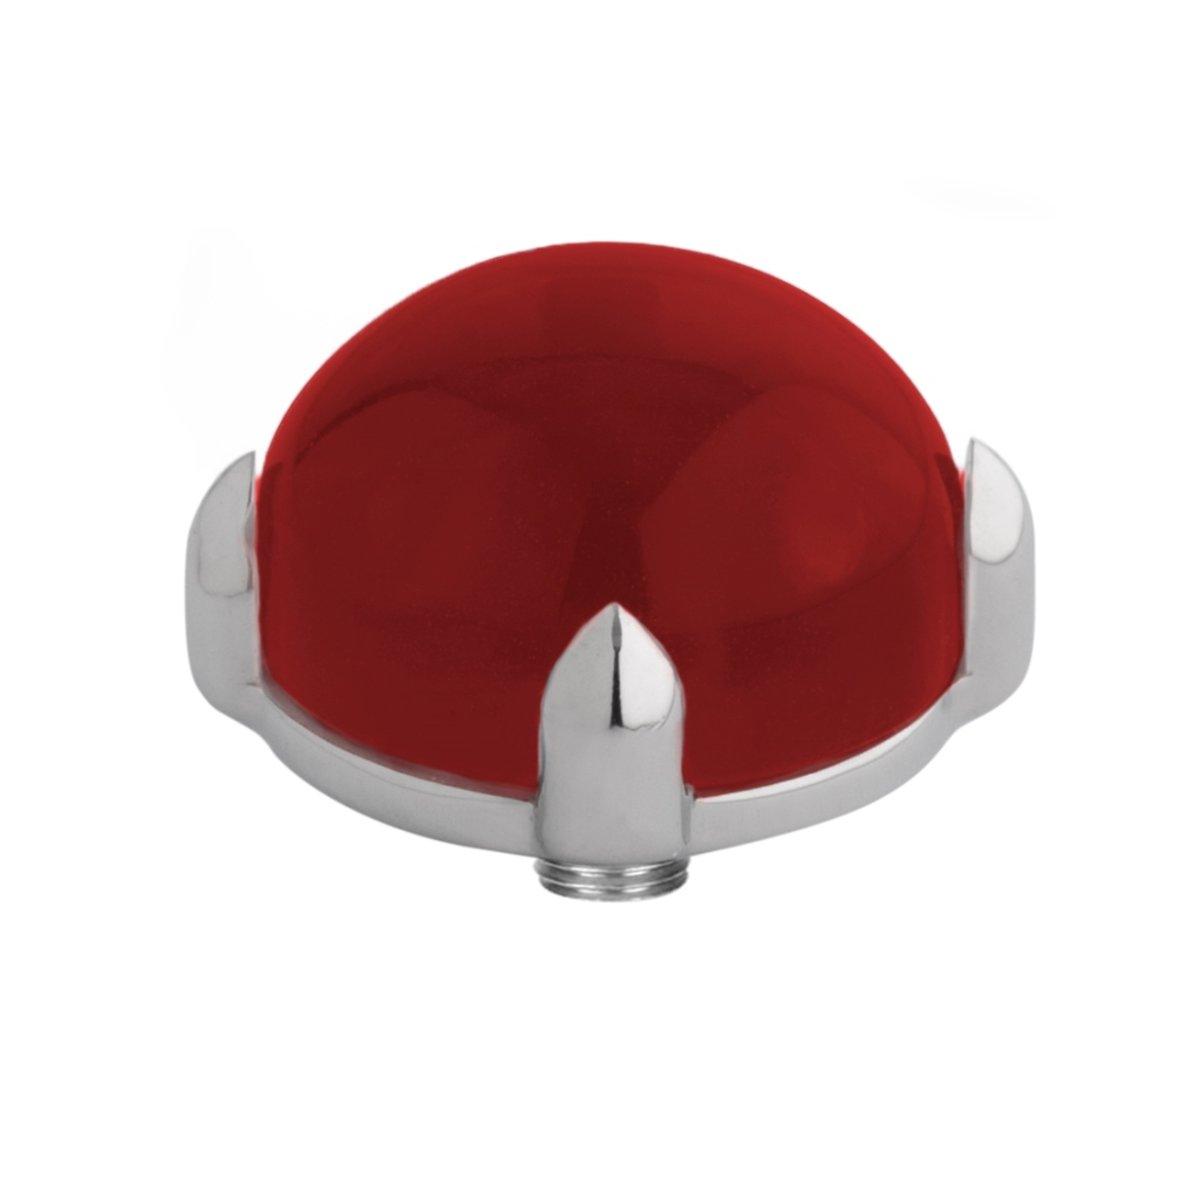 Melano twisted steen bold - Zilverkleurig + Dark red - Dames - 12mm kopen